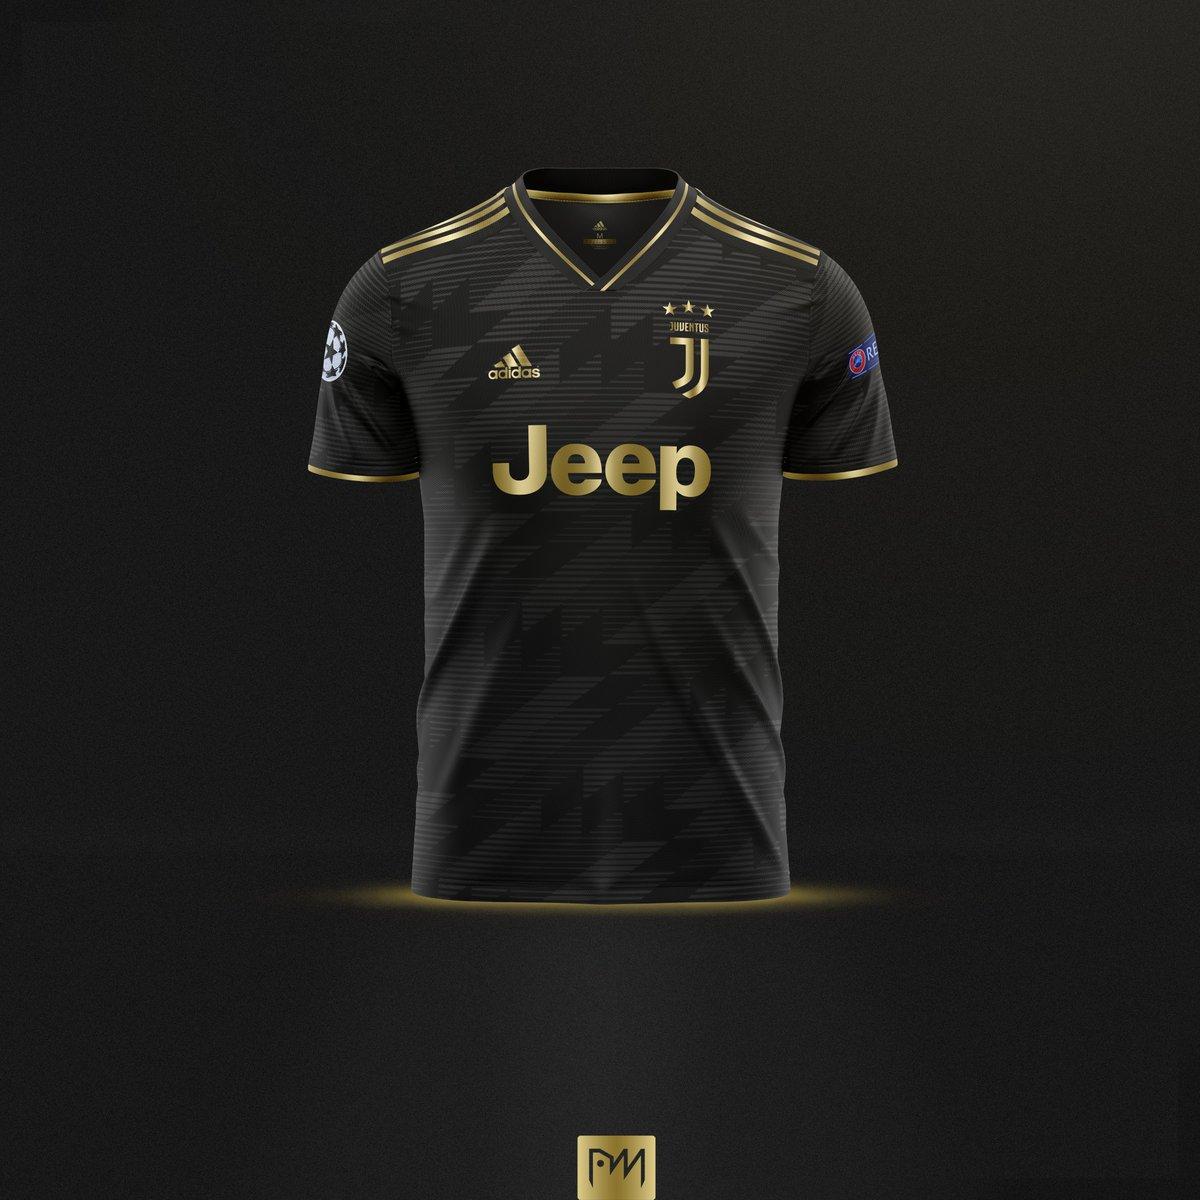 43cffe69652 Concept #Juventus x #adidasfootball Black&Gold 🔥 @juventusfc  @adidasfootball @AroundTurin @La_Bianconera